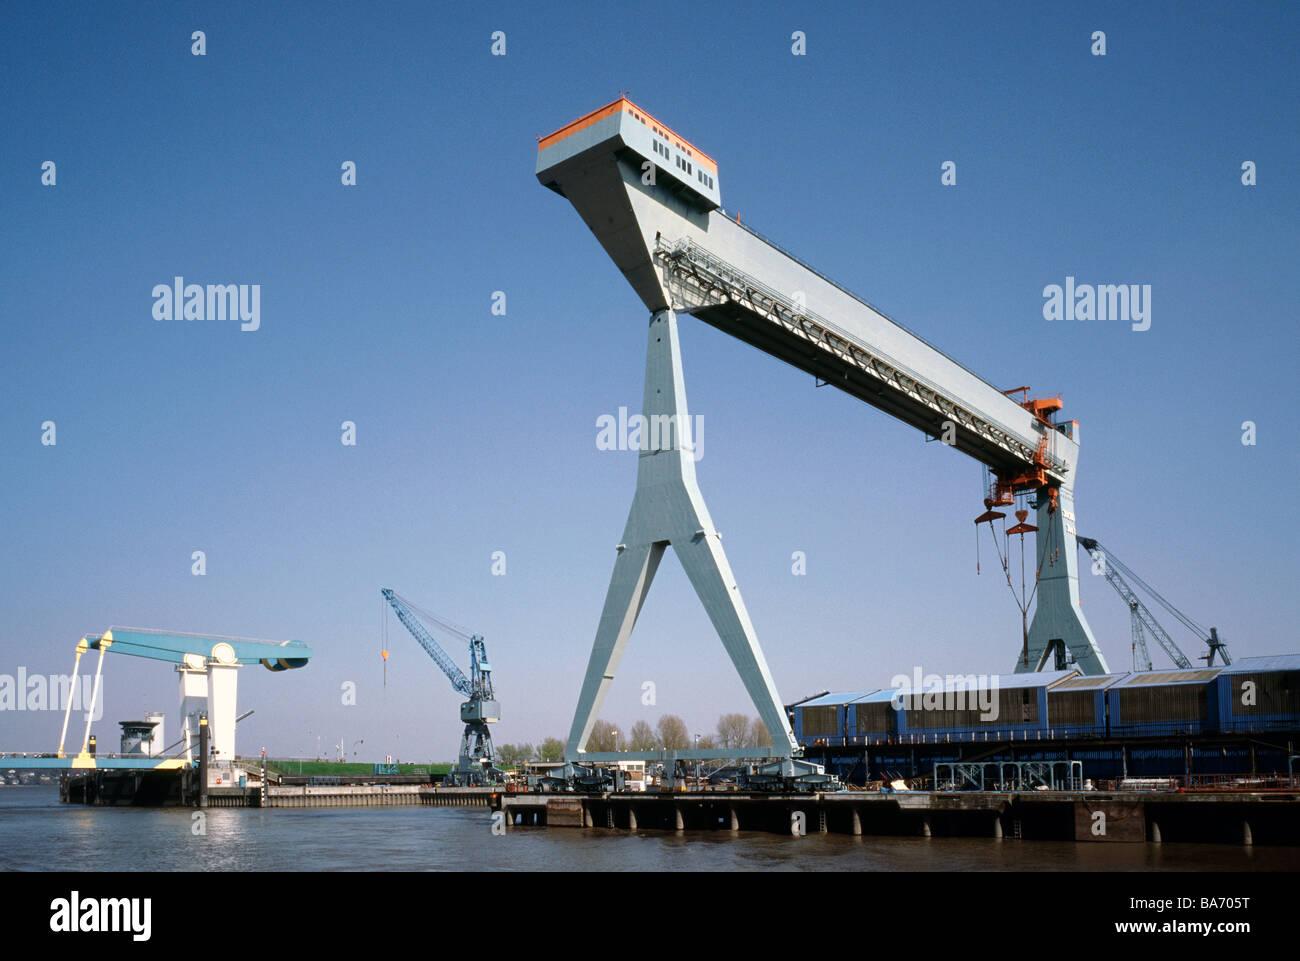 April 10, 2009 - JJ Sietas shipyard at Neuenfelde outside the German city of Hamburg. - Stock Image